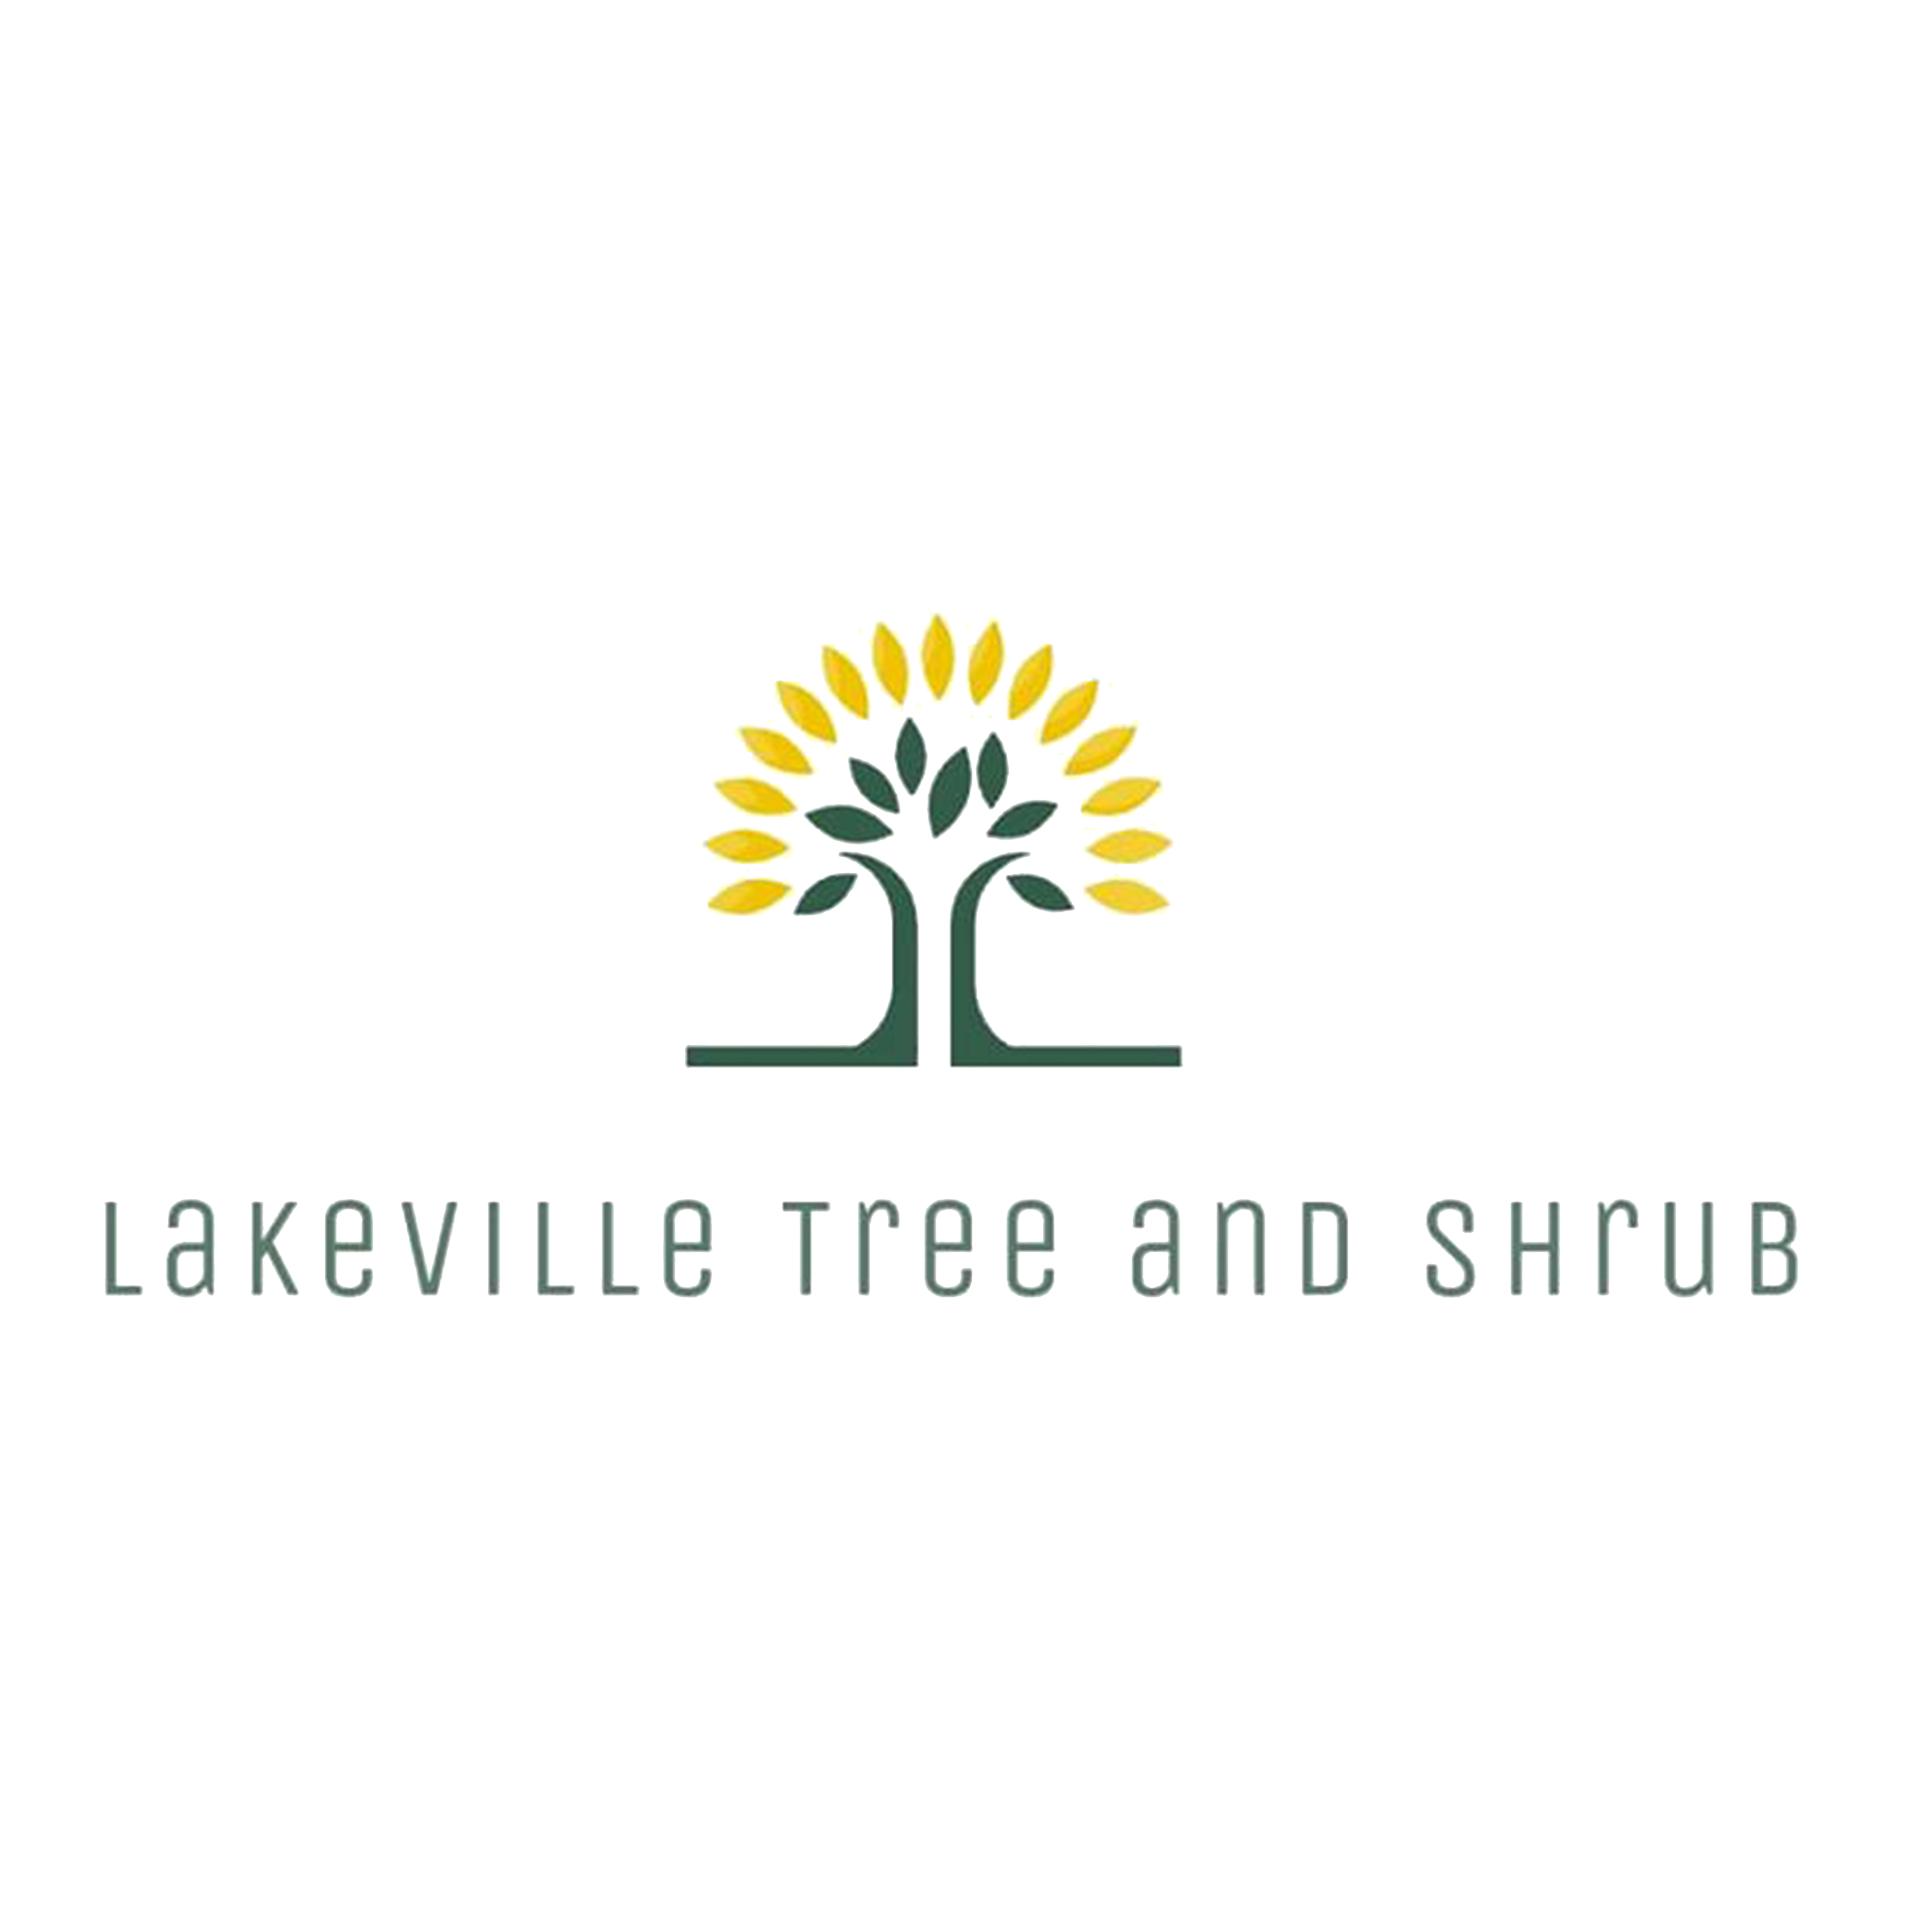 Lakeville Tree and Shrub